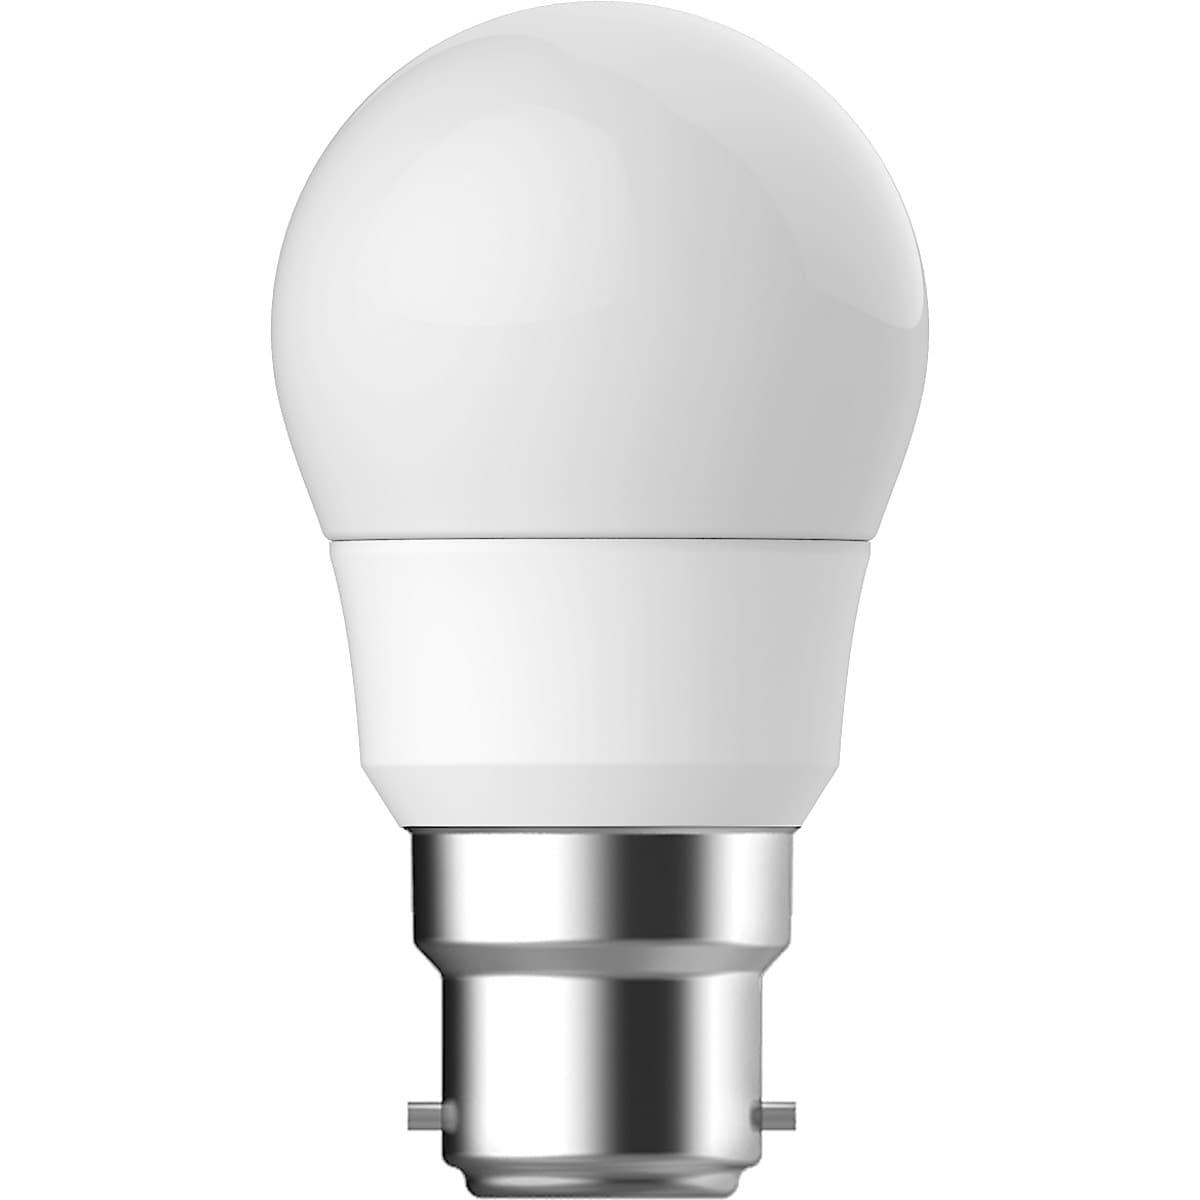 Northlight B22 LED Golf Ball Bulb Cool White